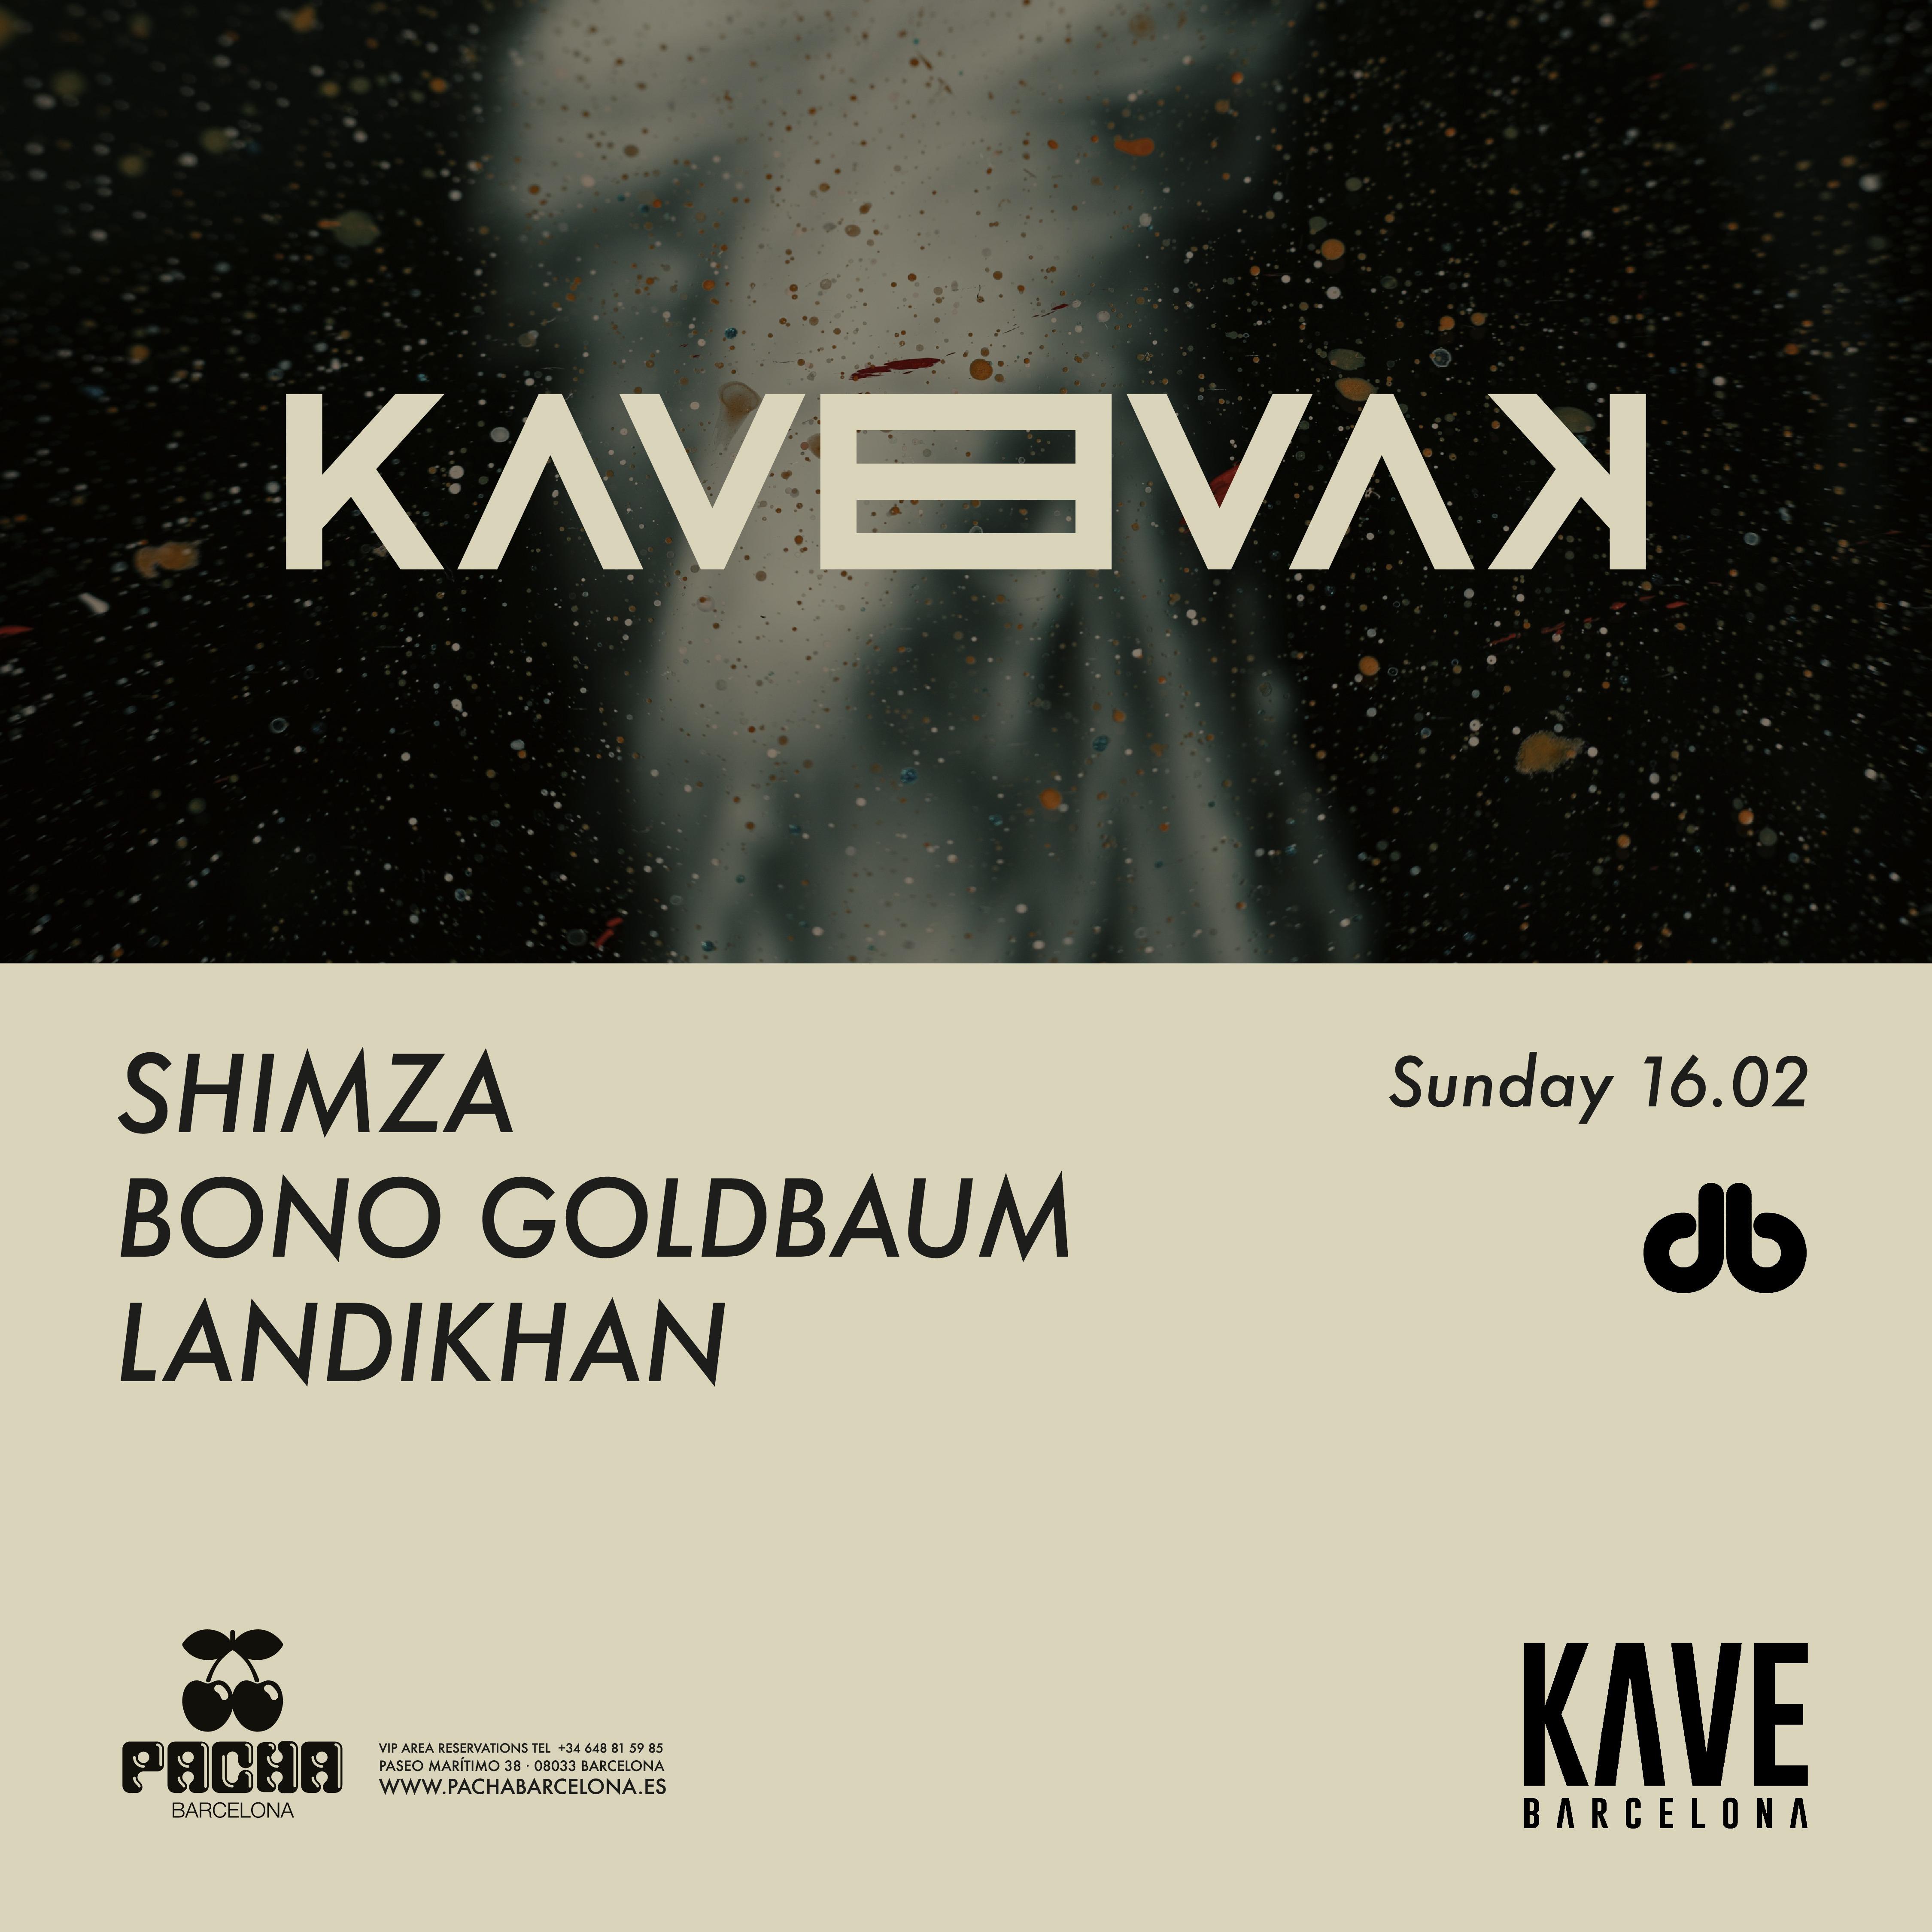 SIGHT IN COLLABORATION WITH KAVE PRES. SHIMZA, BONO GOLDBAUM AND LANDIKHAN PACHA BARCELONA